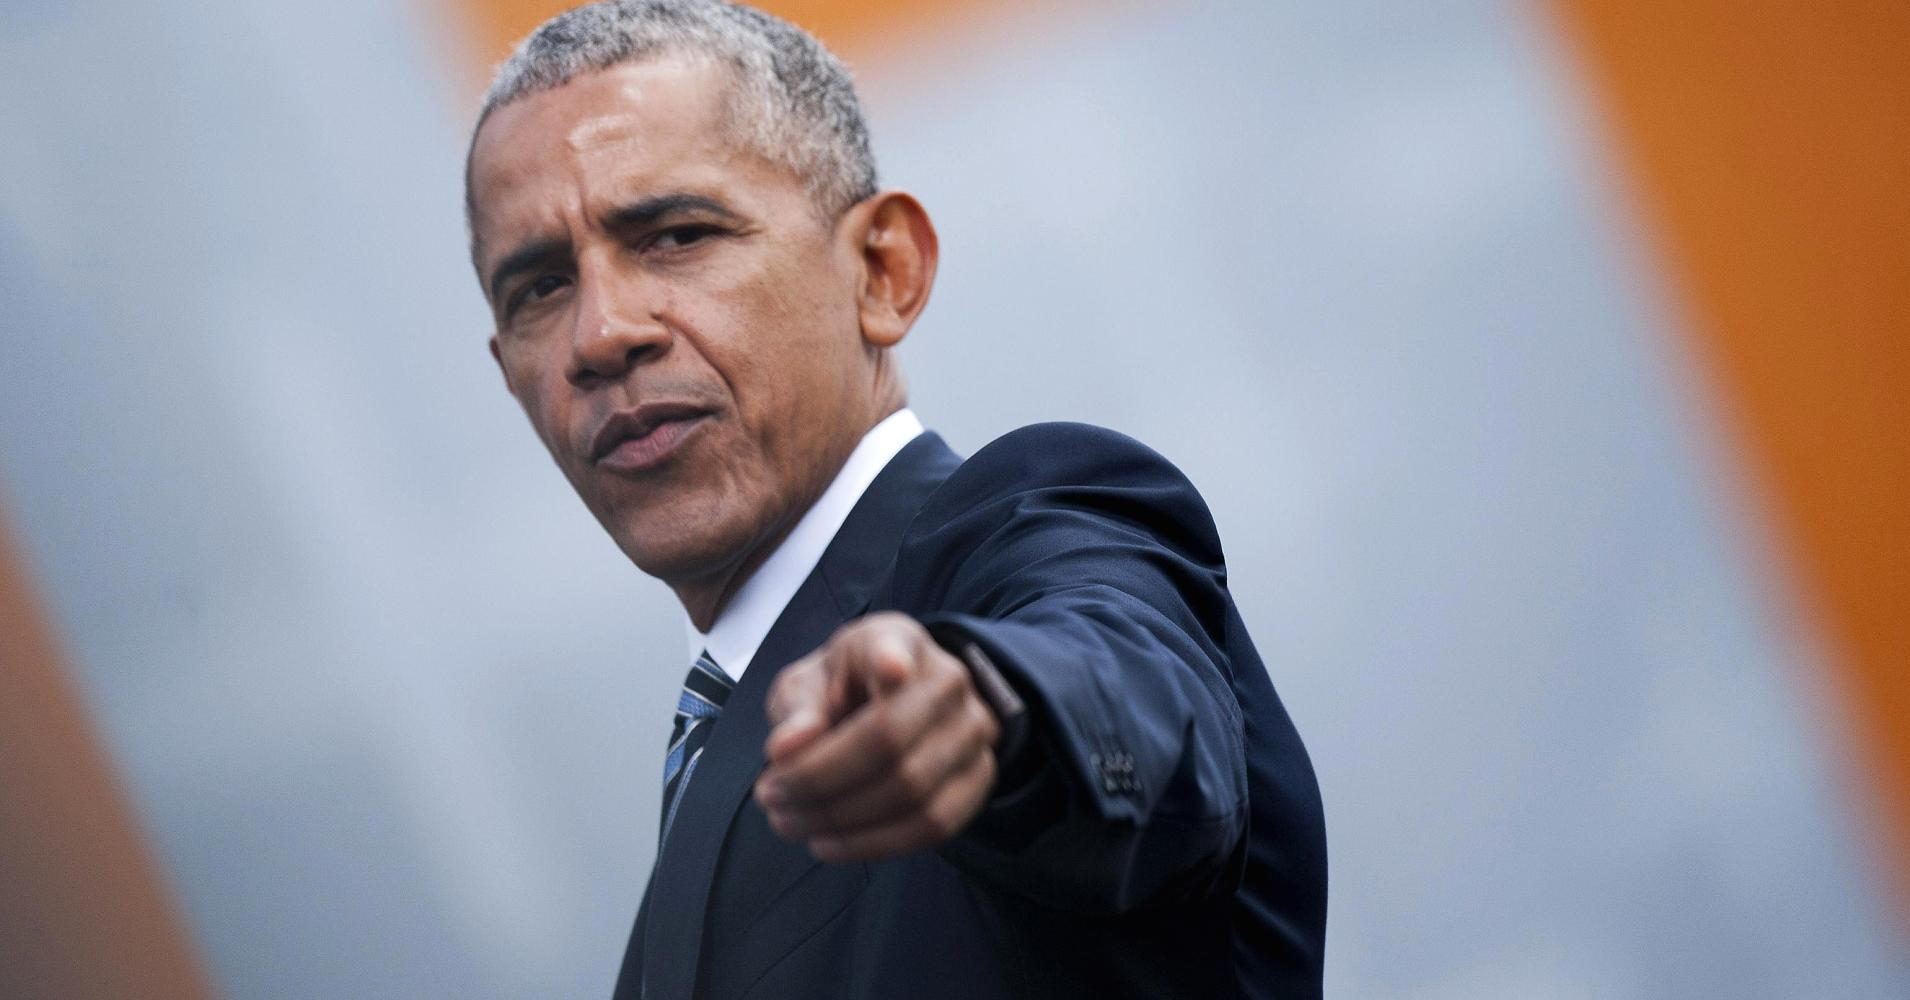 Barack Obama became the first Sitting American President to visit Kenya.